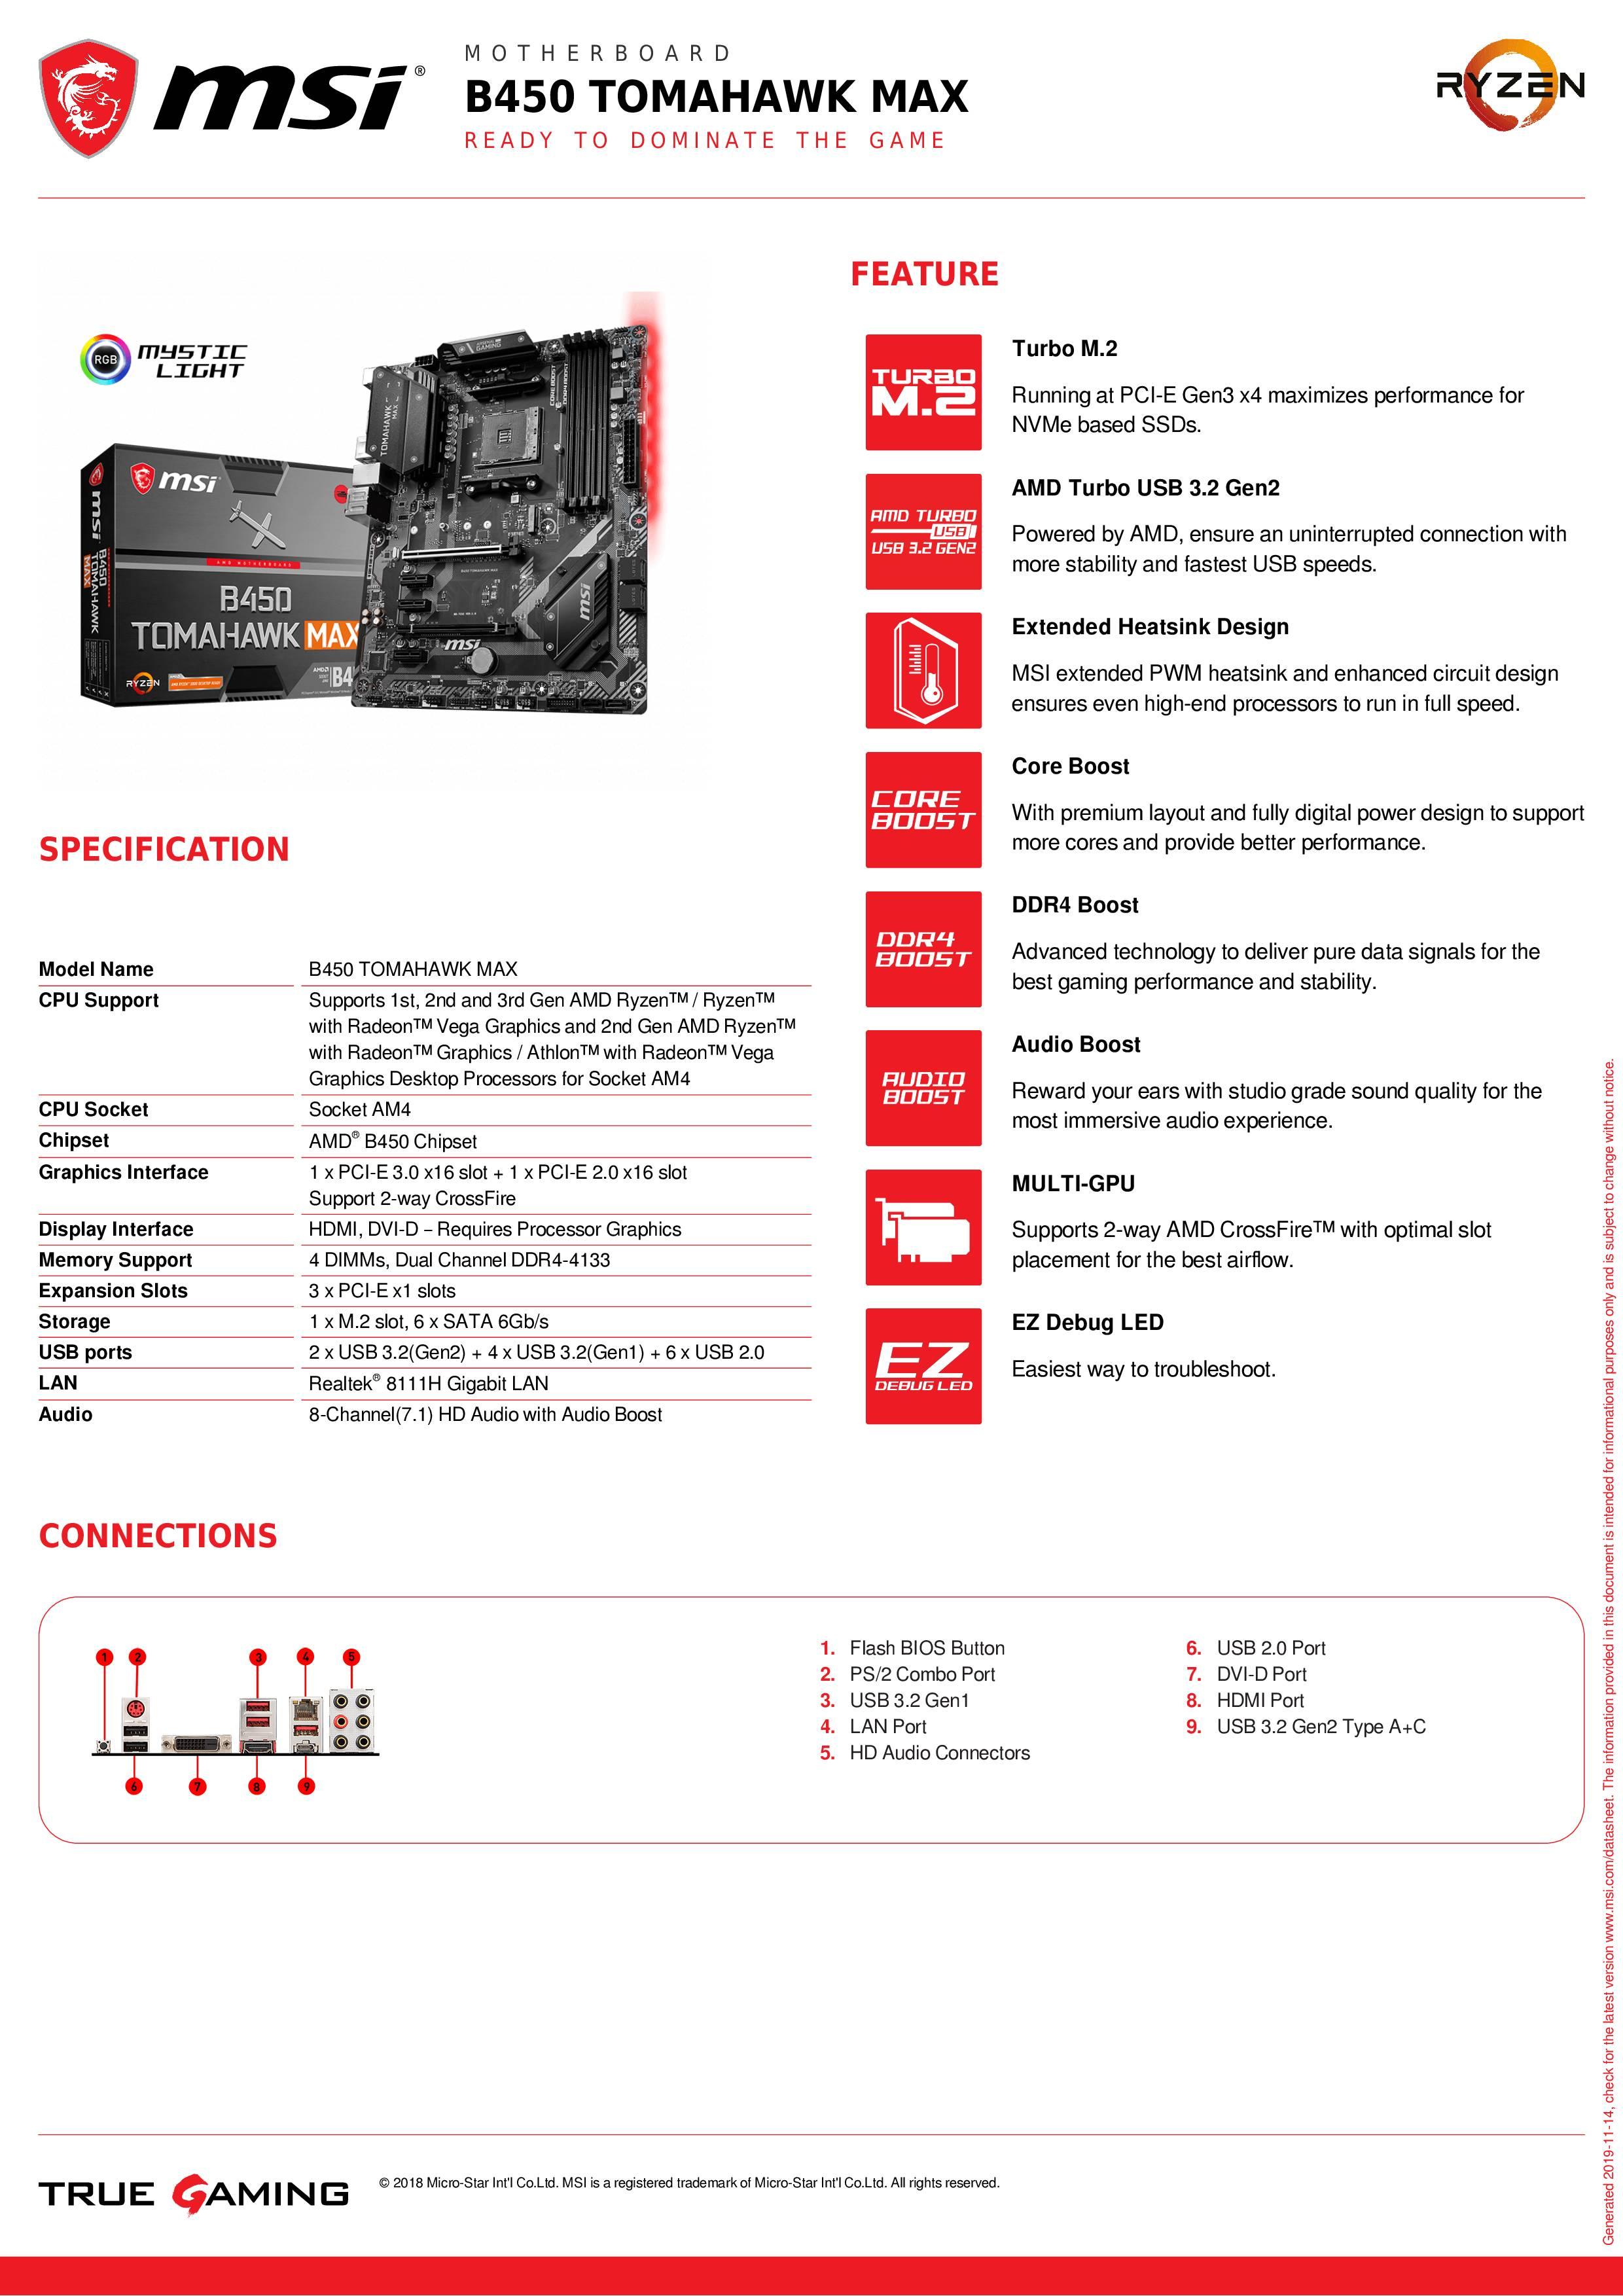 Материнская плата MSI b450 tomahawk max amd ryzen 3rd cpu am4 gaming M.2 USB 3,1 4xDDR4 Crossfire ATX b450 новая материнская плата 2011